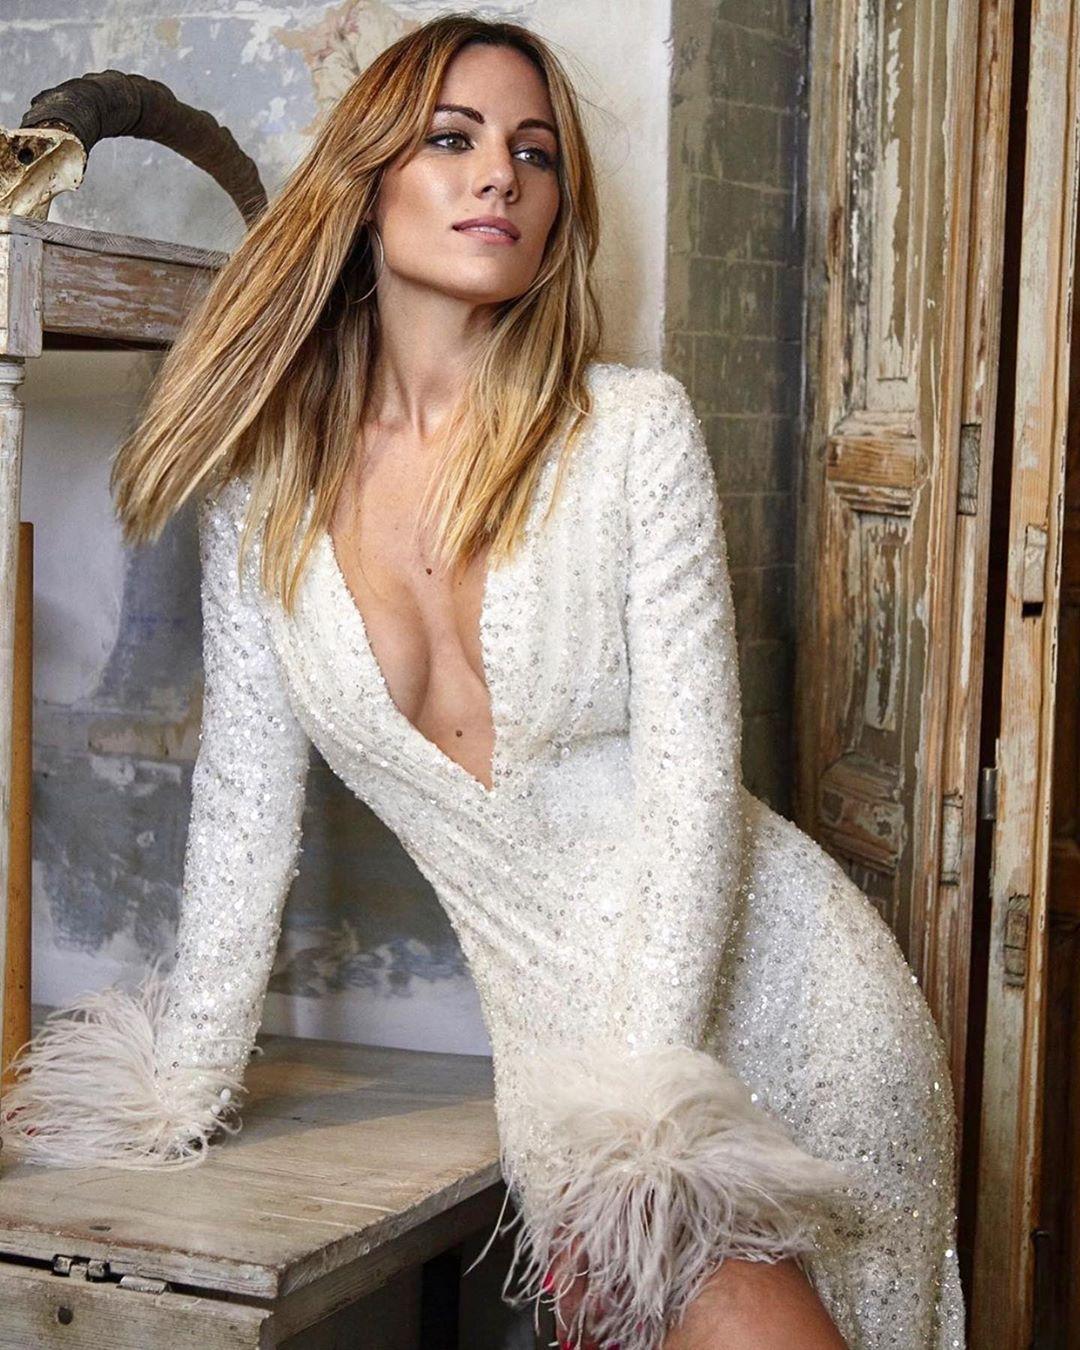 edurne cleavage pics